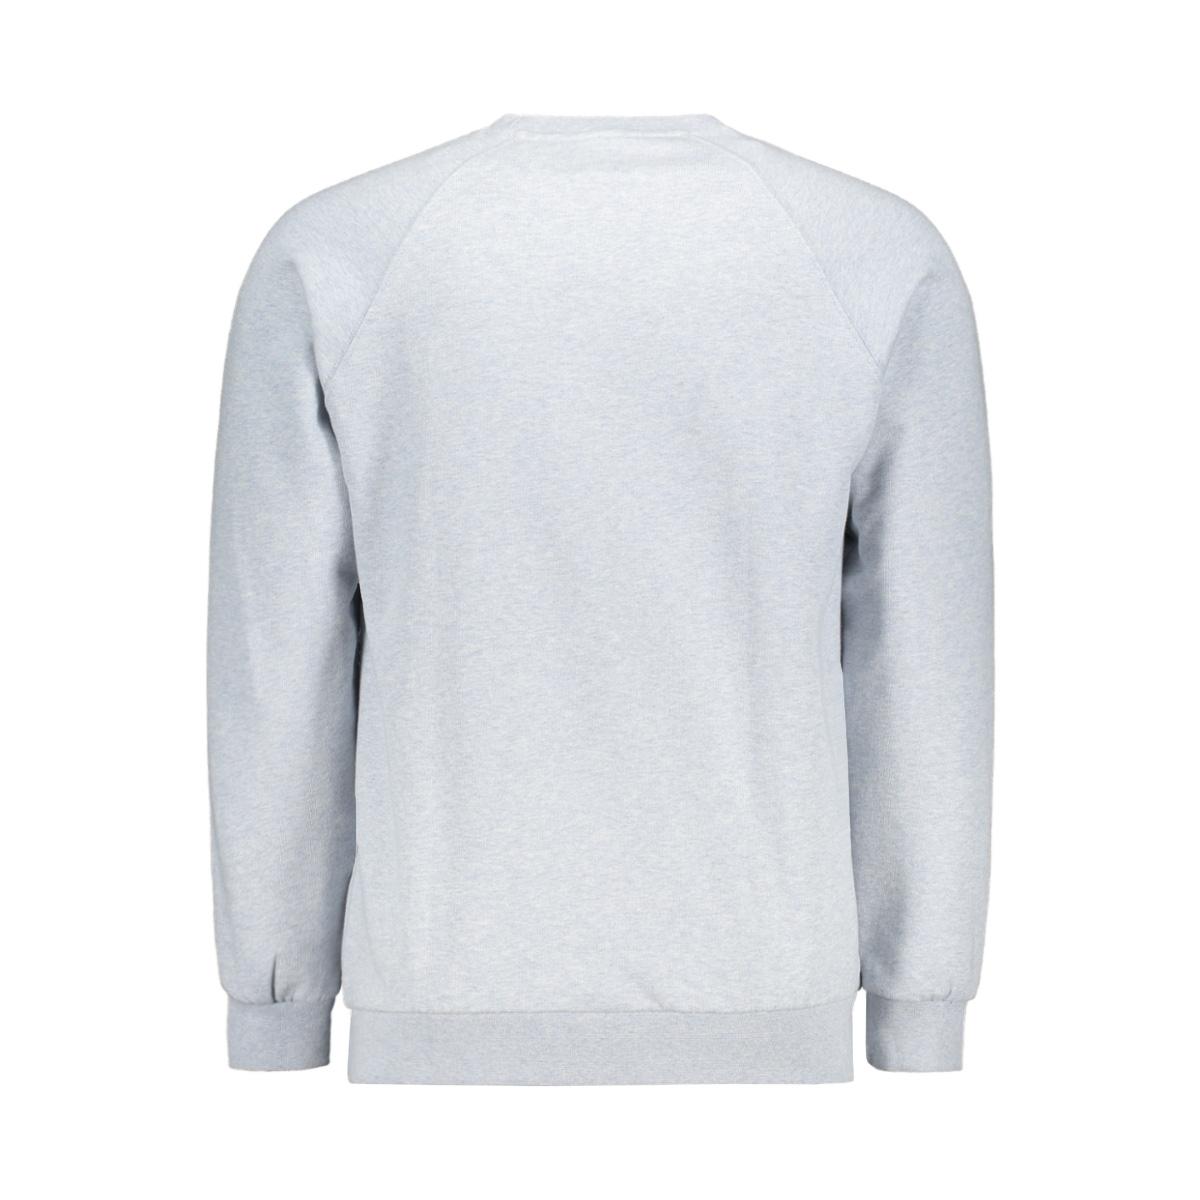 21 20sw100 5 marnelli sweater 015